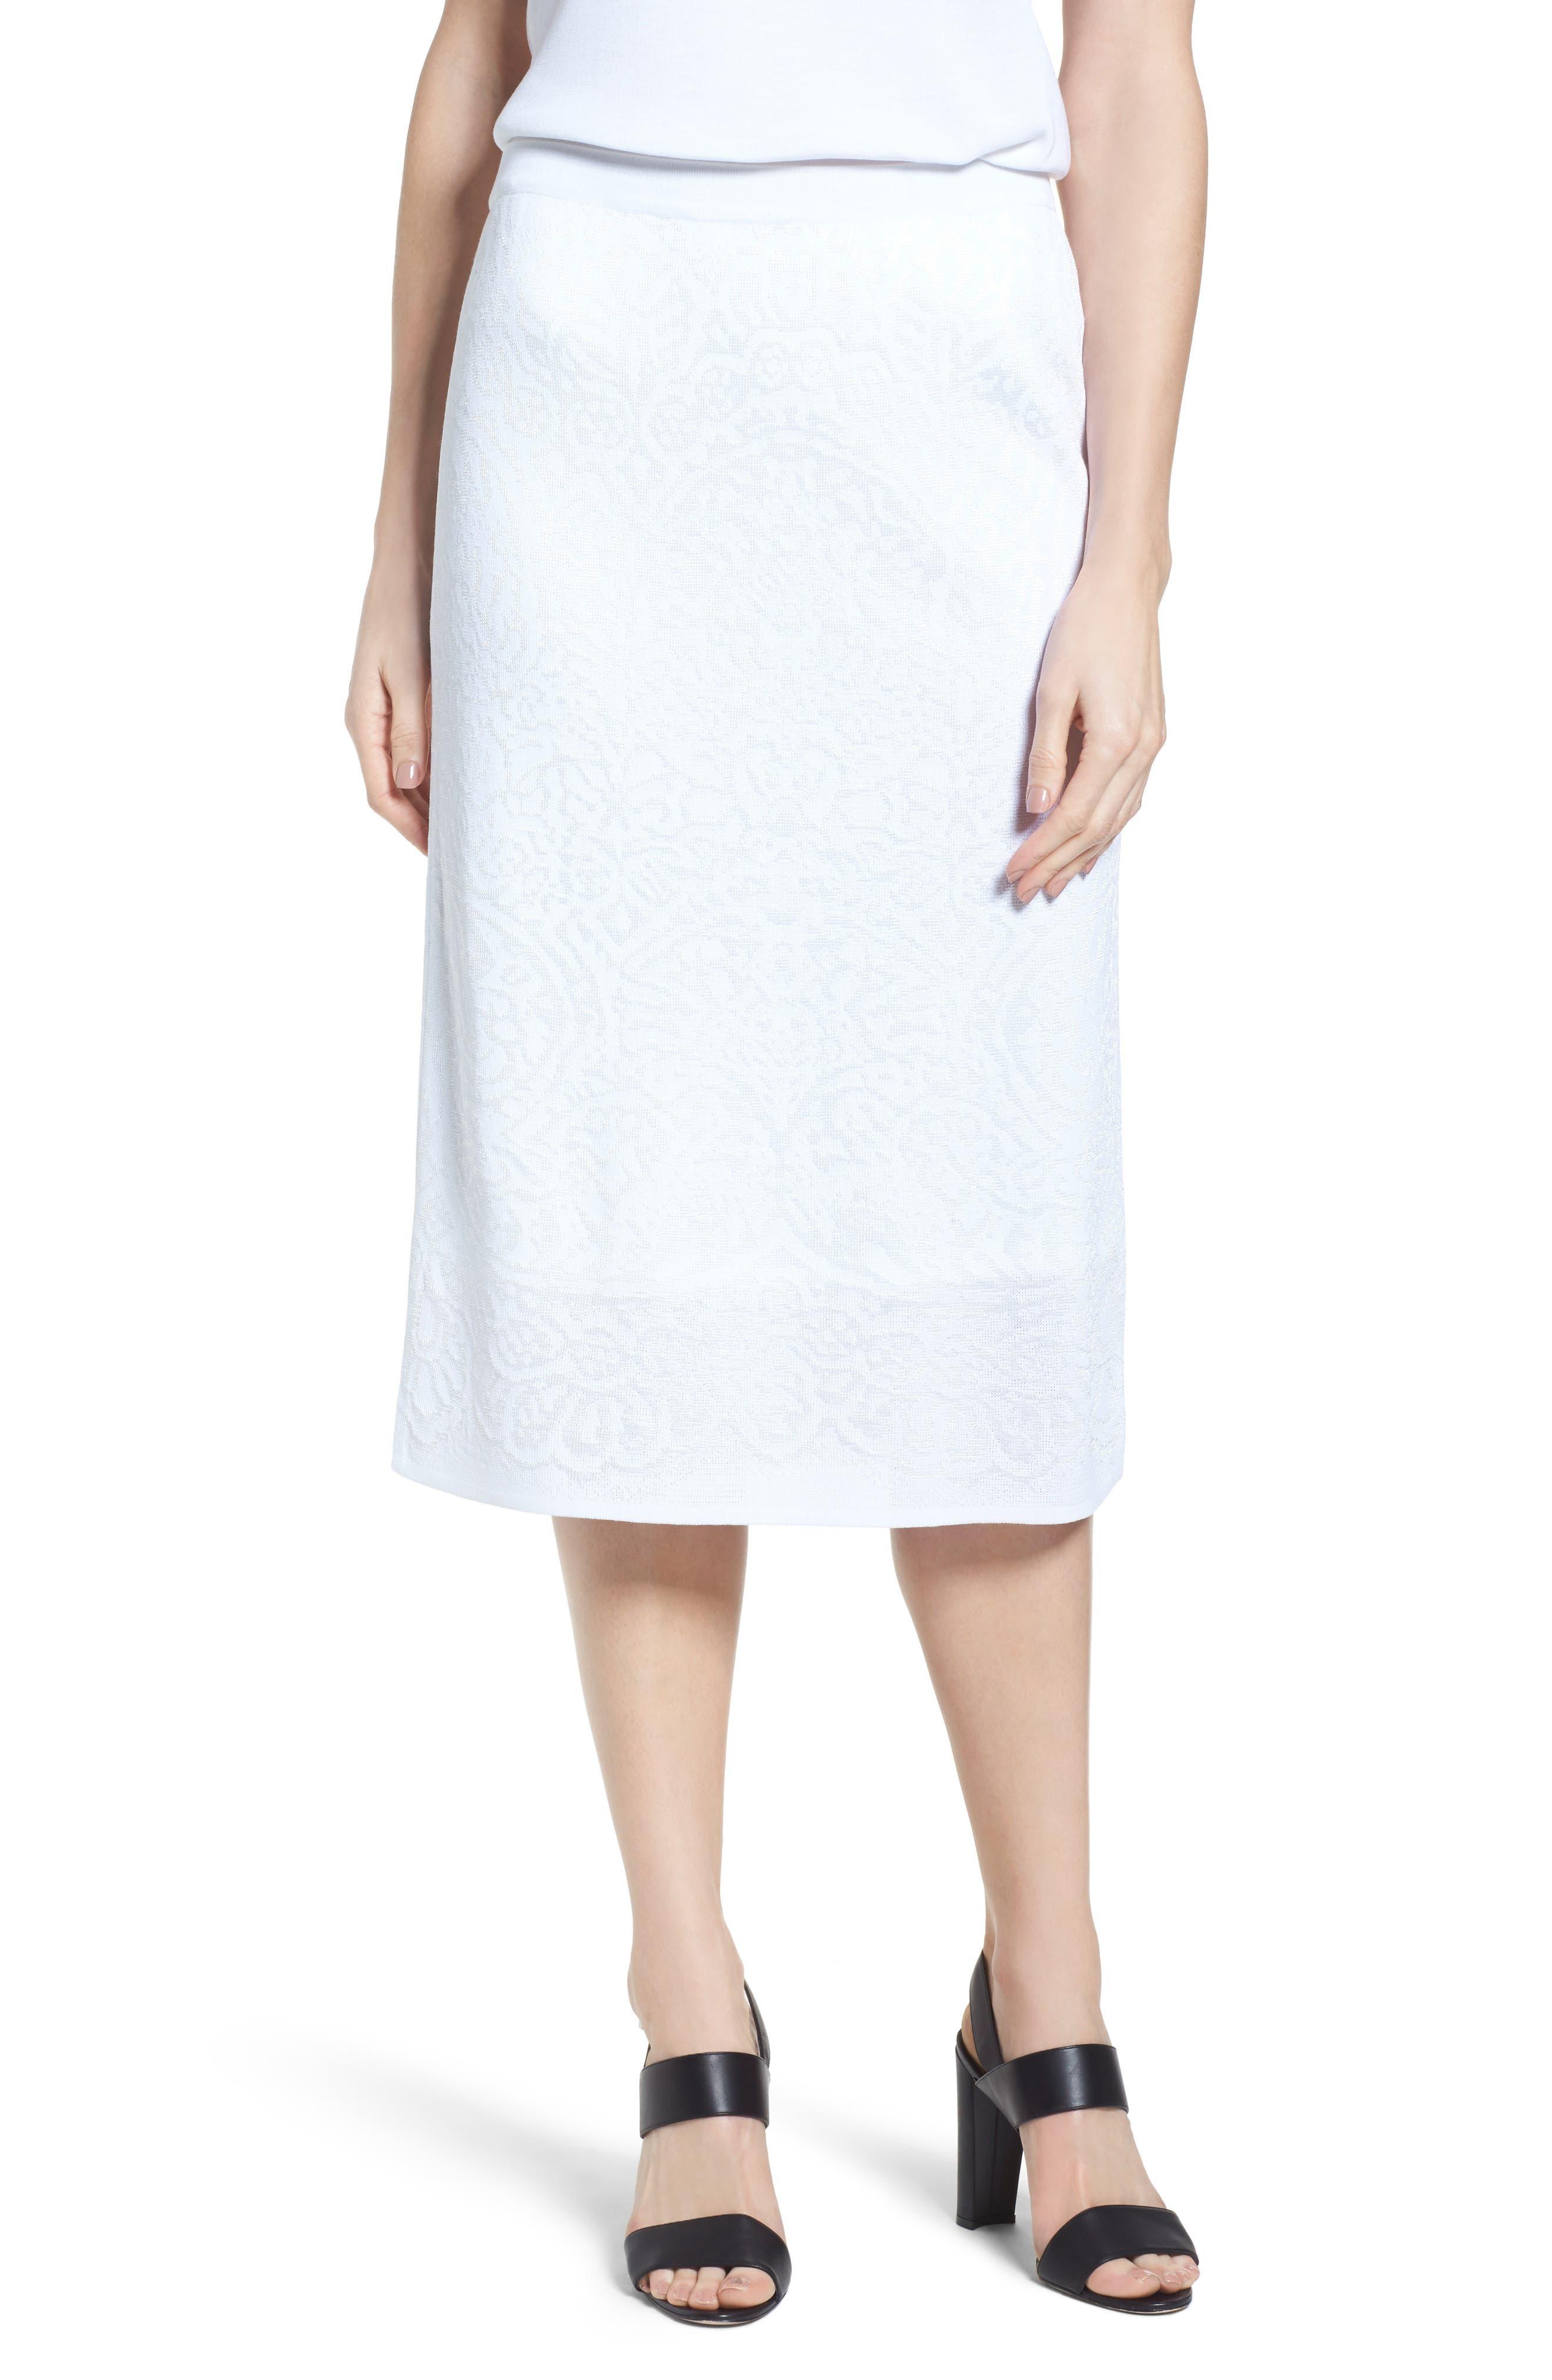 Alternate Image 1 Selected - Ming Wang Jacquard Knit Straight Skirt